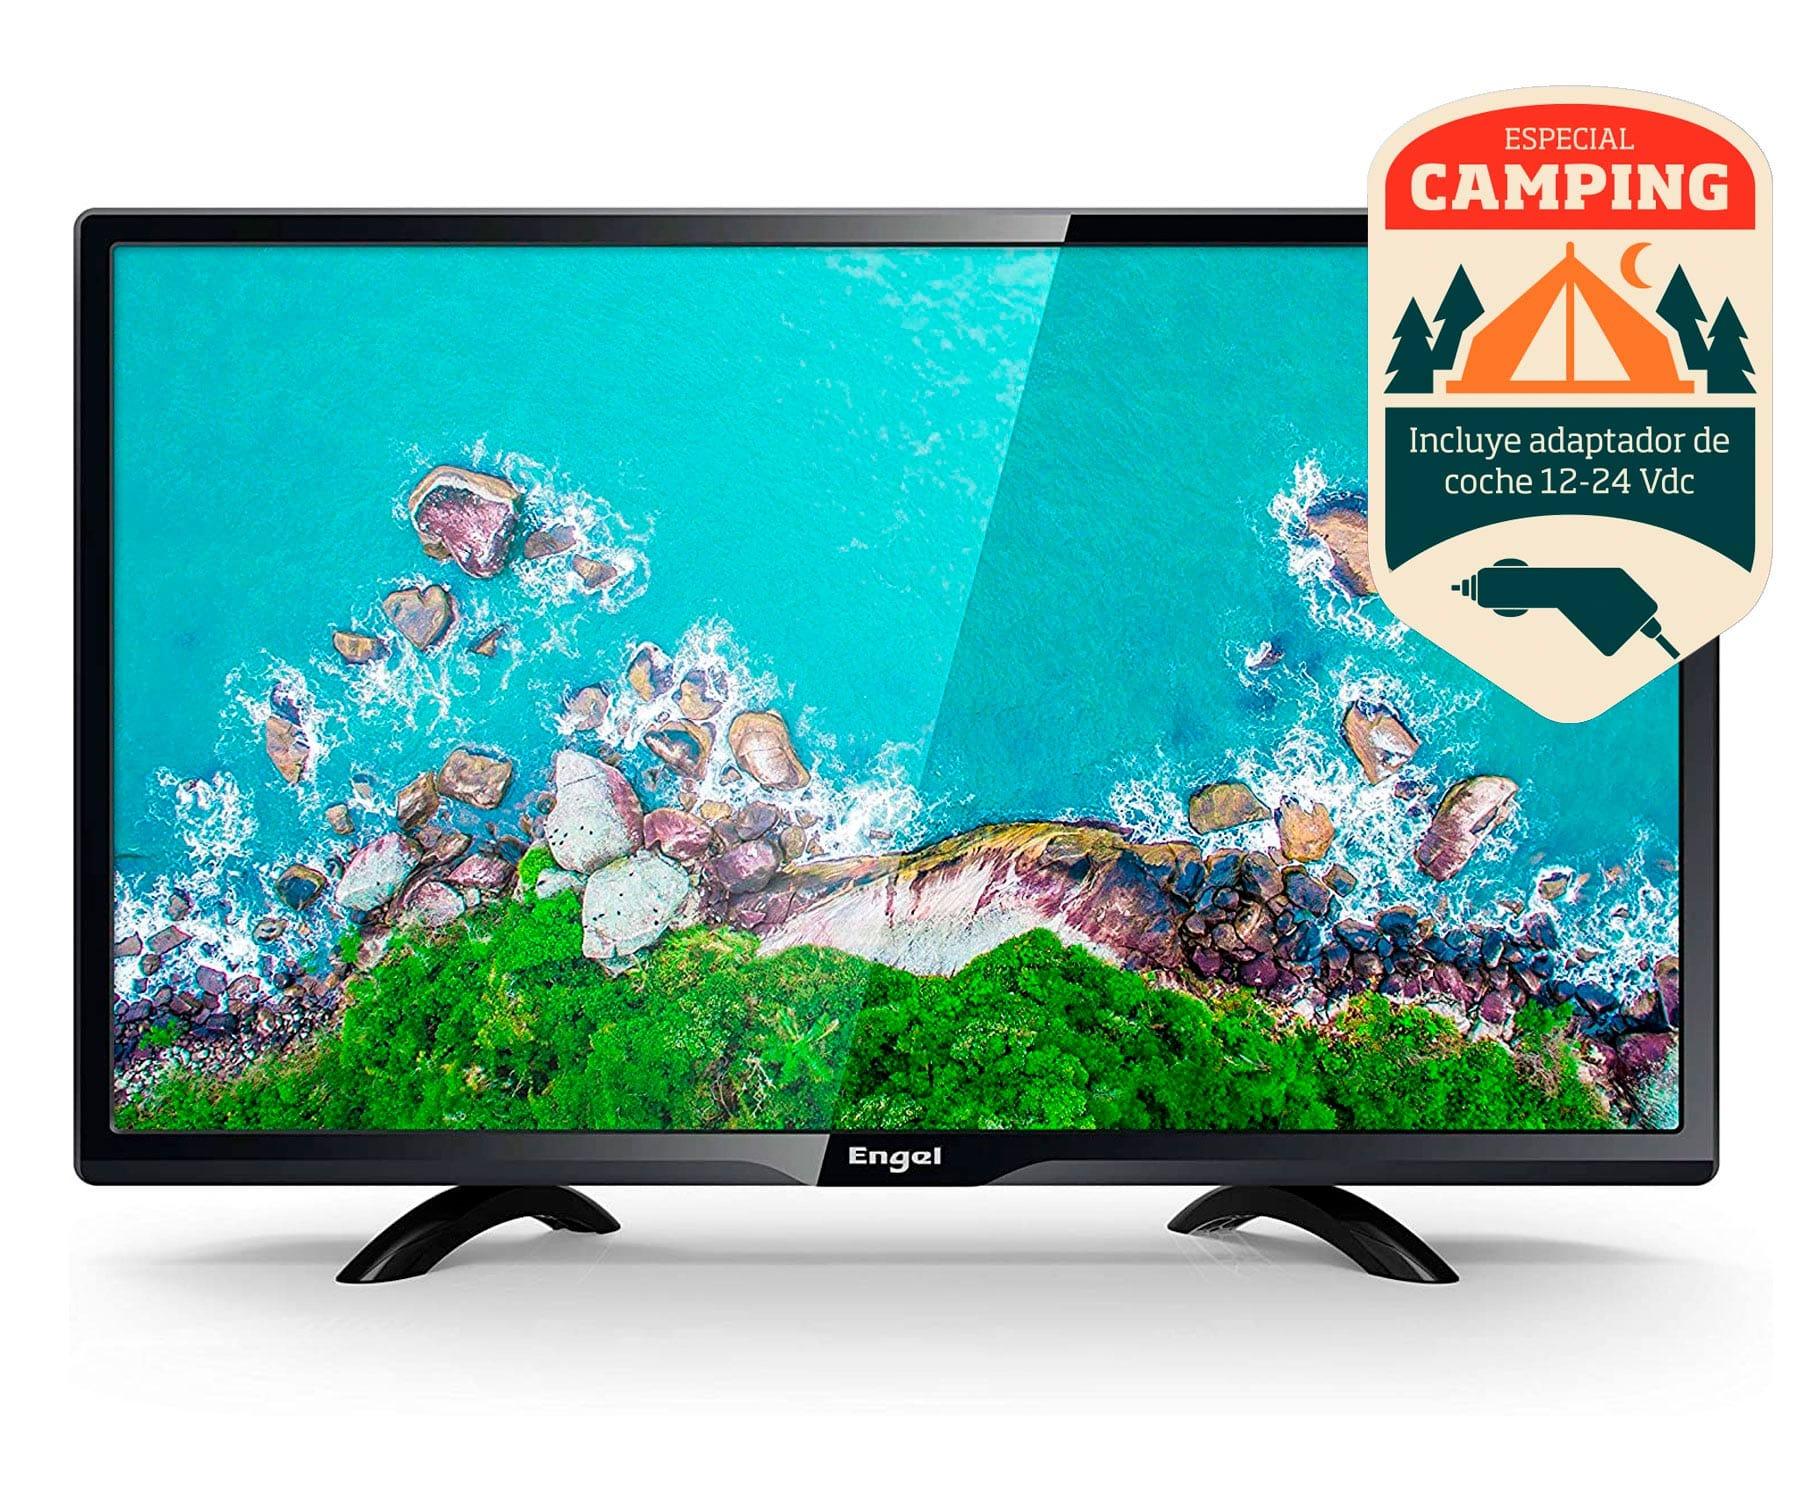 Engel 24LE2462T2 TV 24'' LED HD READY/Especial Camping/HDMI/VGA/USB